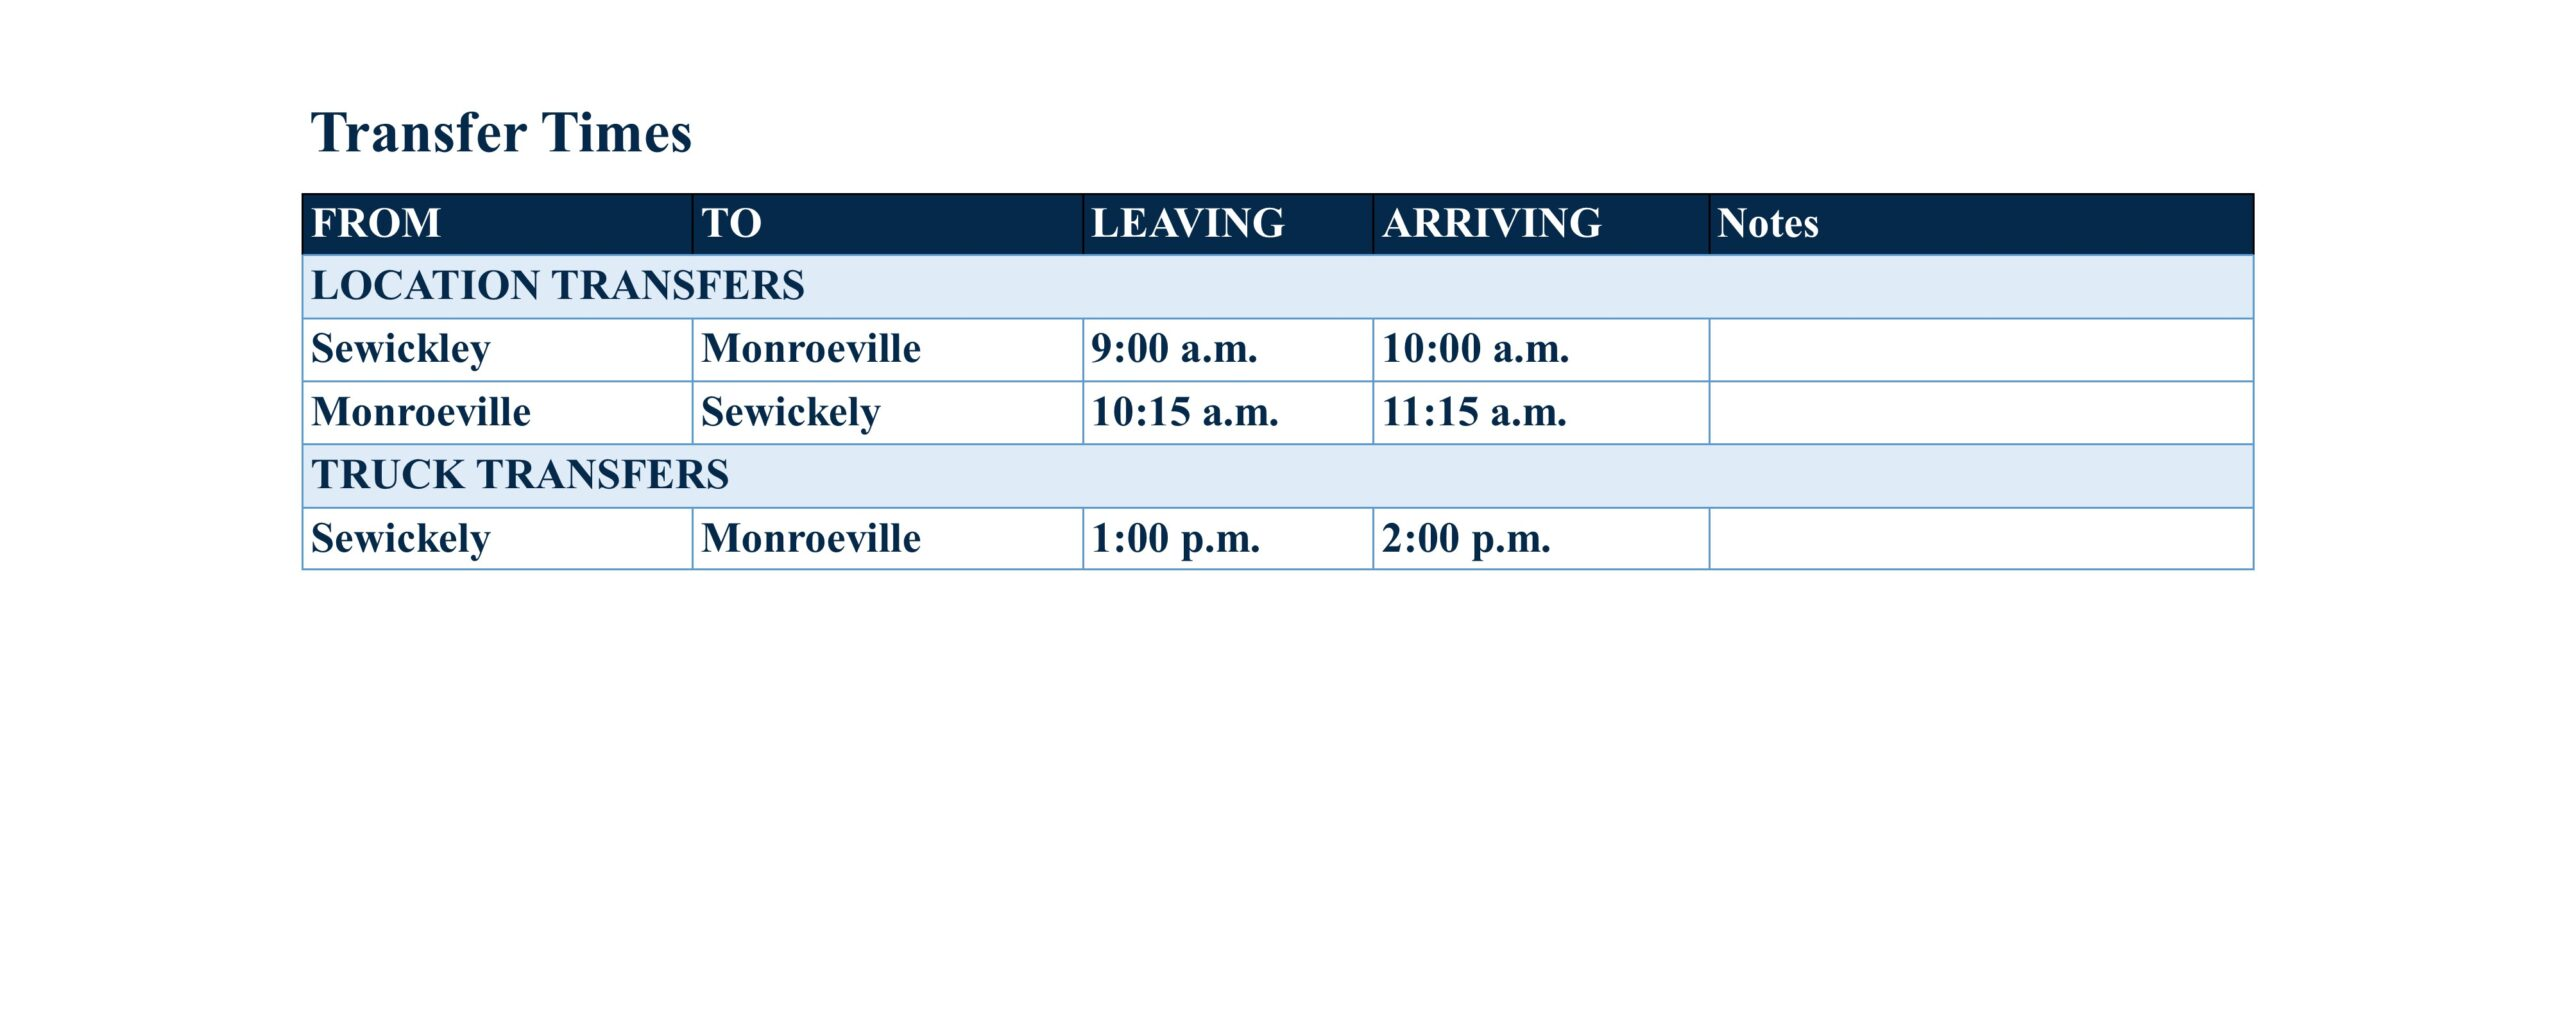 Monroeville - Transfers